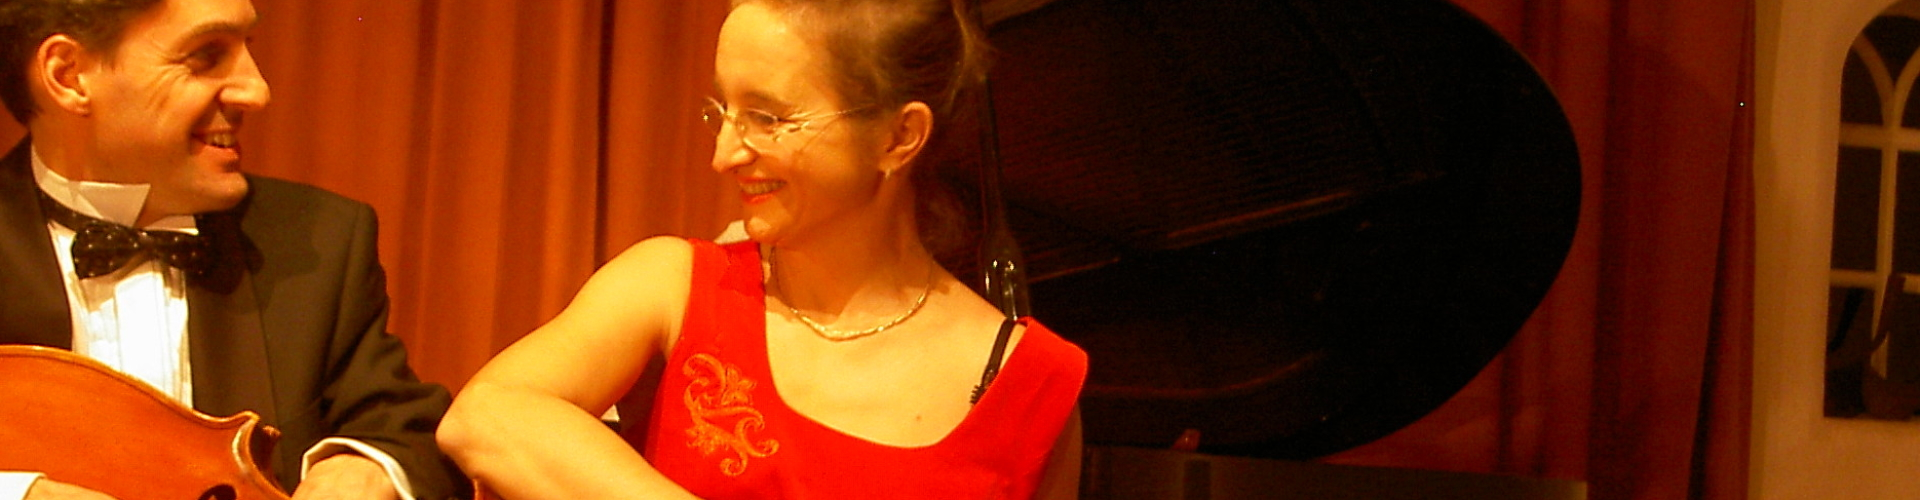 Live Muziek en Les op Cello en Piano